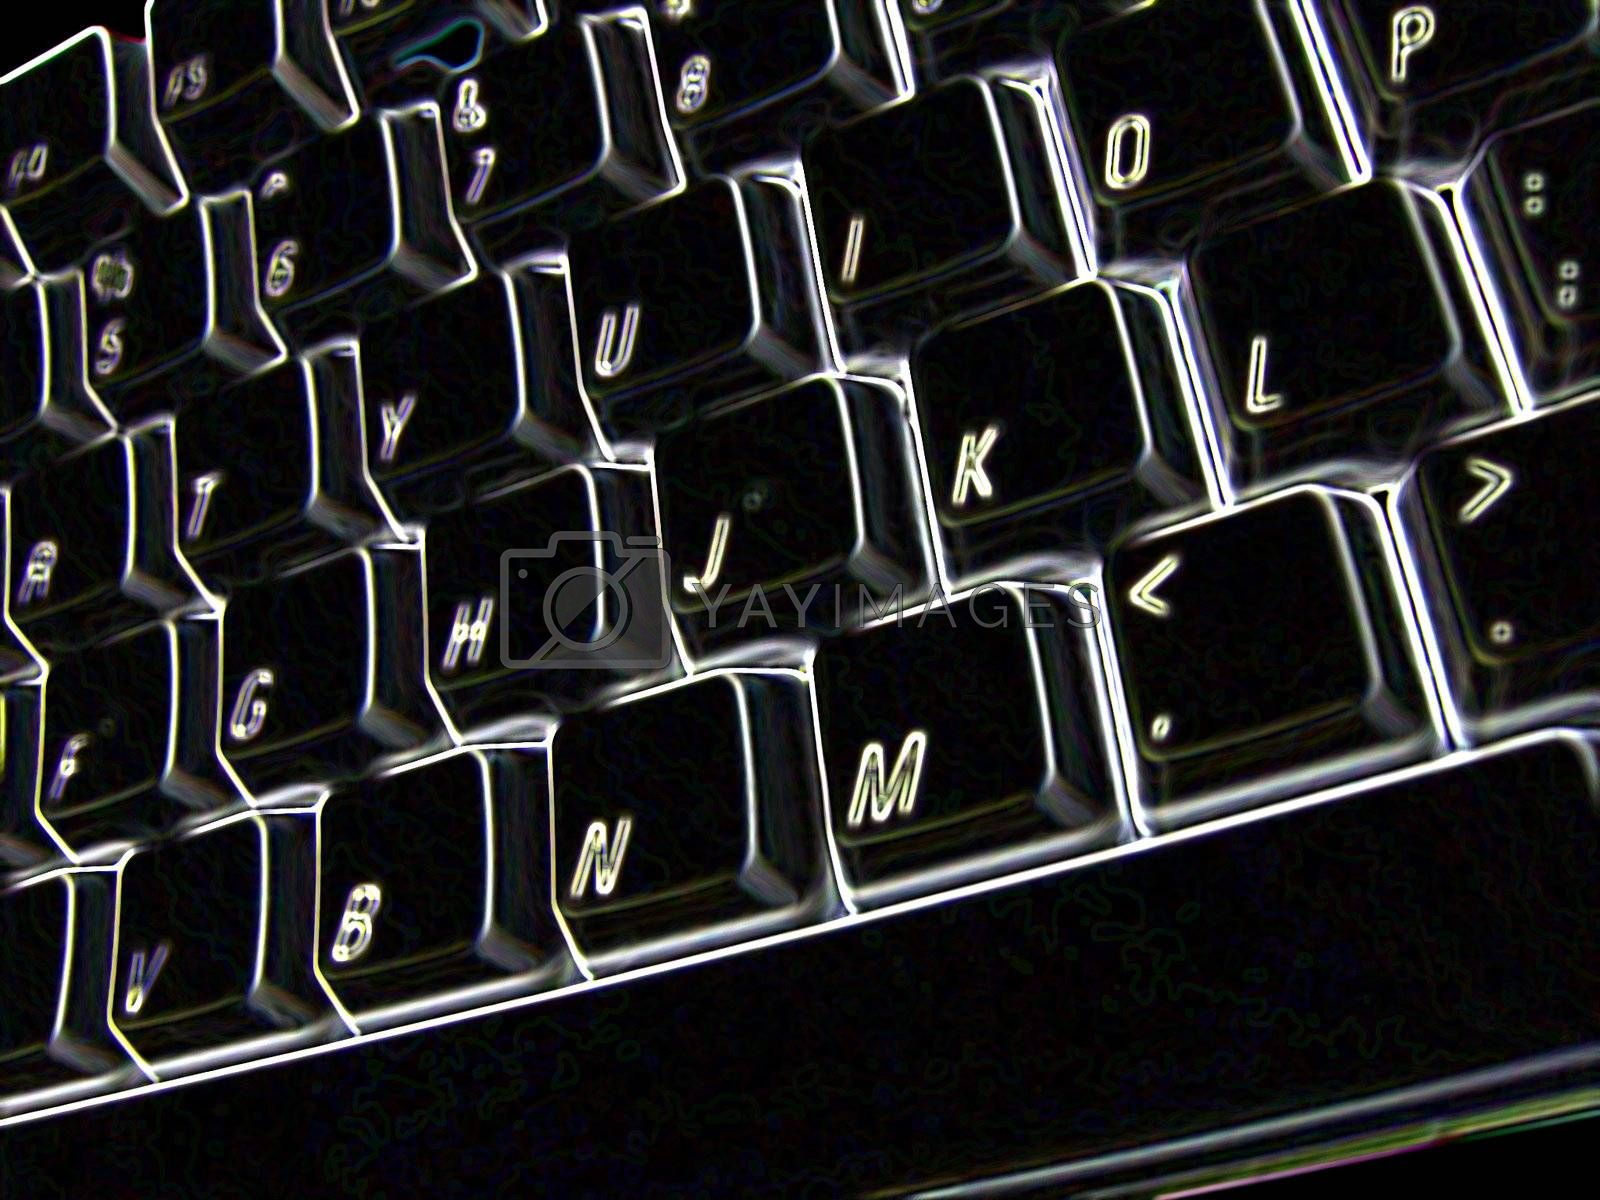 Solarized keyboard.